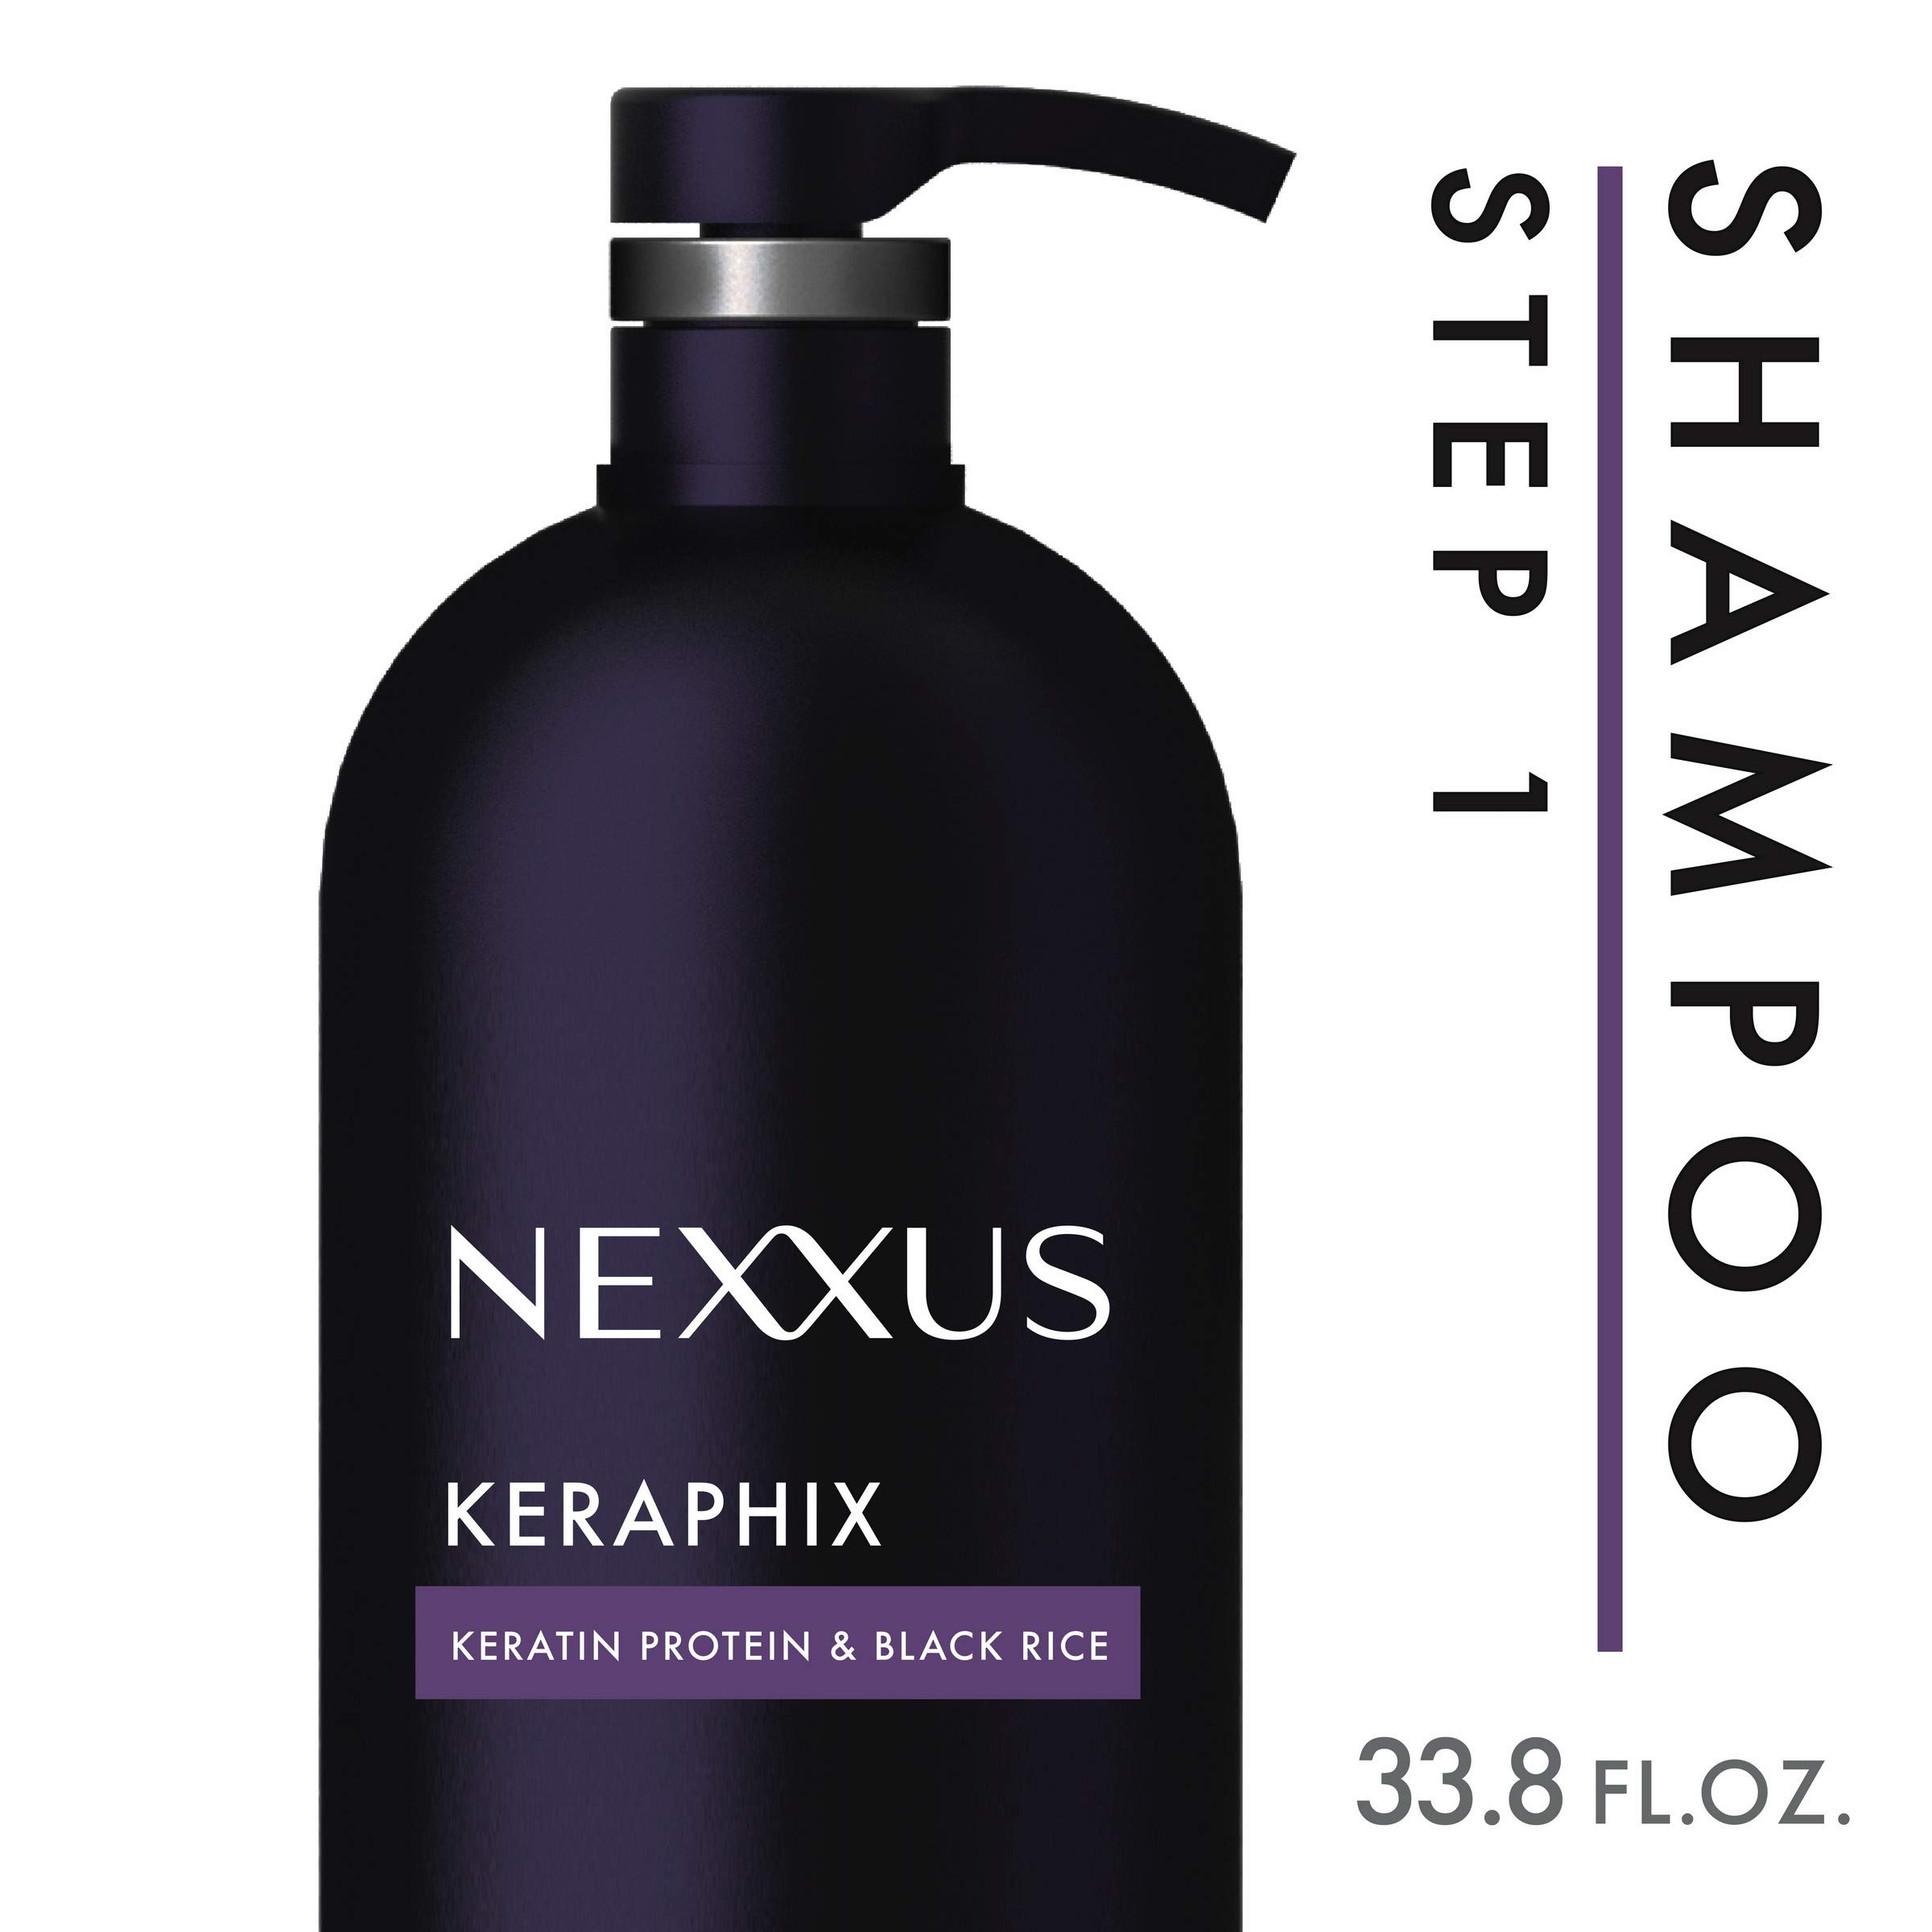 Nexxus Keraphix Shampoo, for Damaged Hair, 33.8 oz by Nexxus